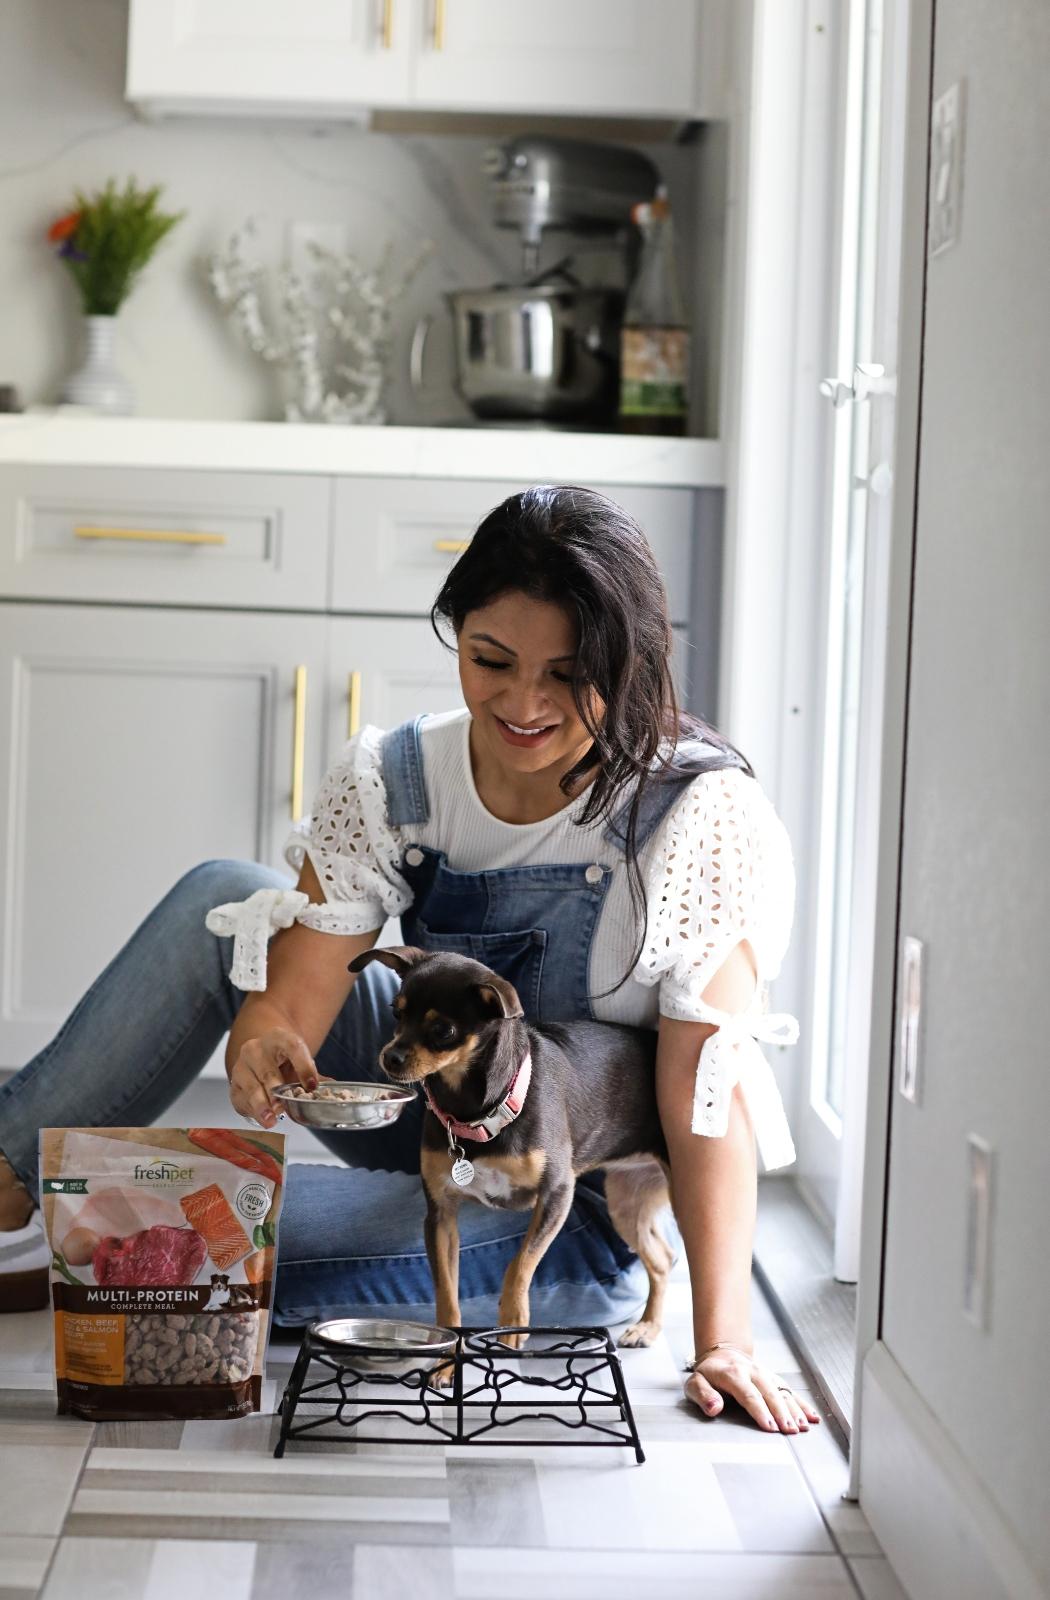 Debbie Savage Blog_Freshpet Healthy Dog Food Fresh From the Fridge